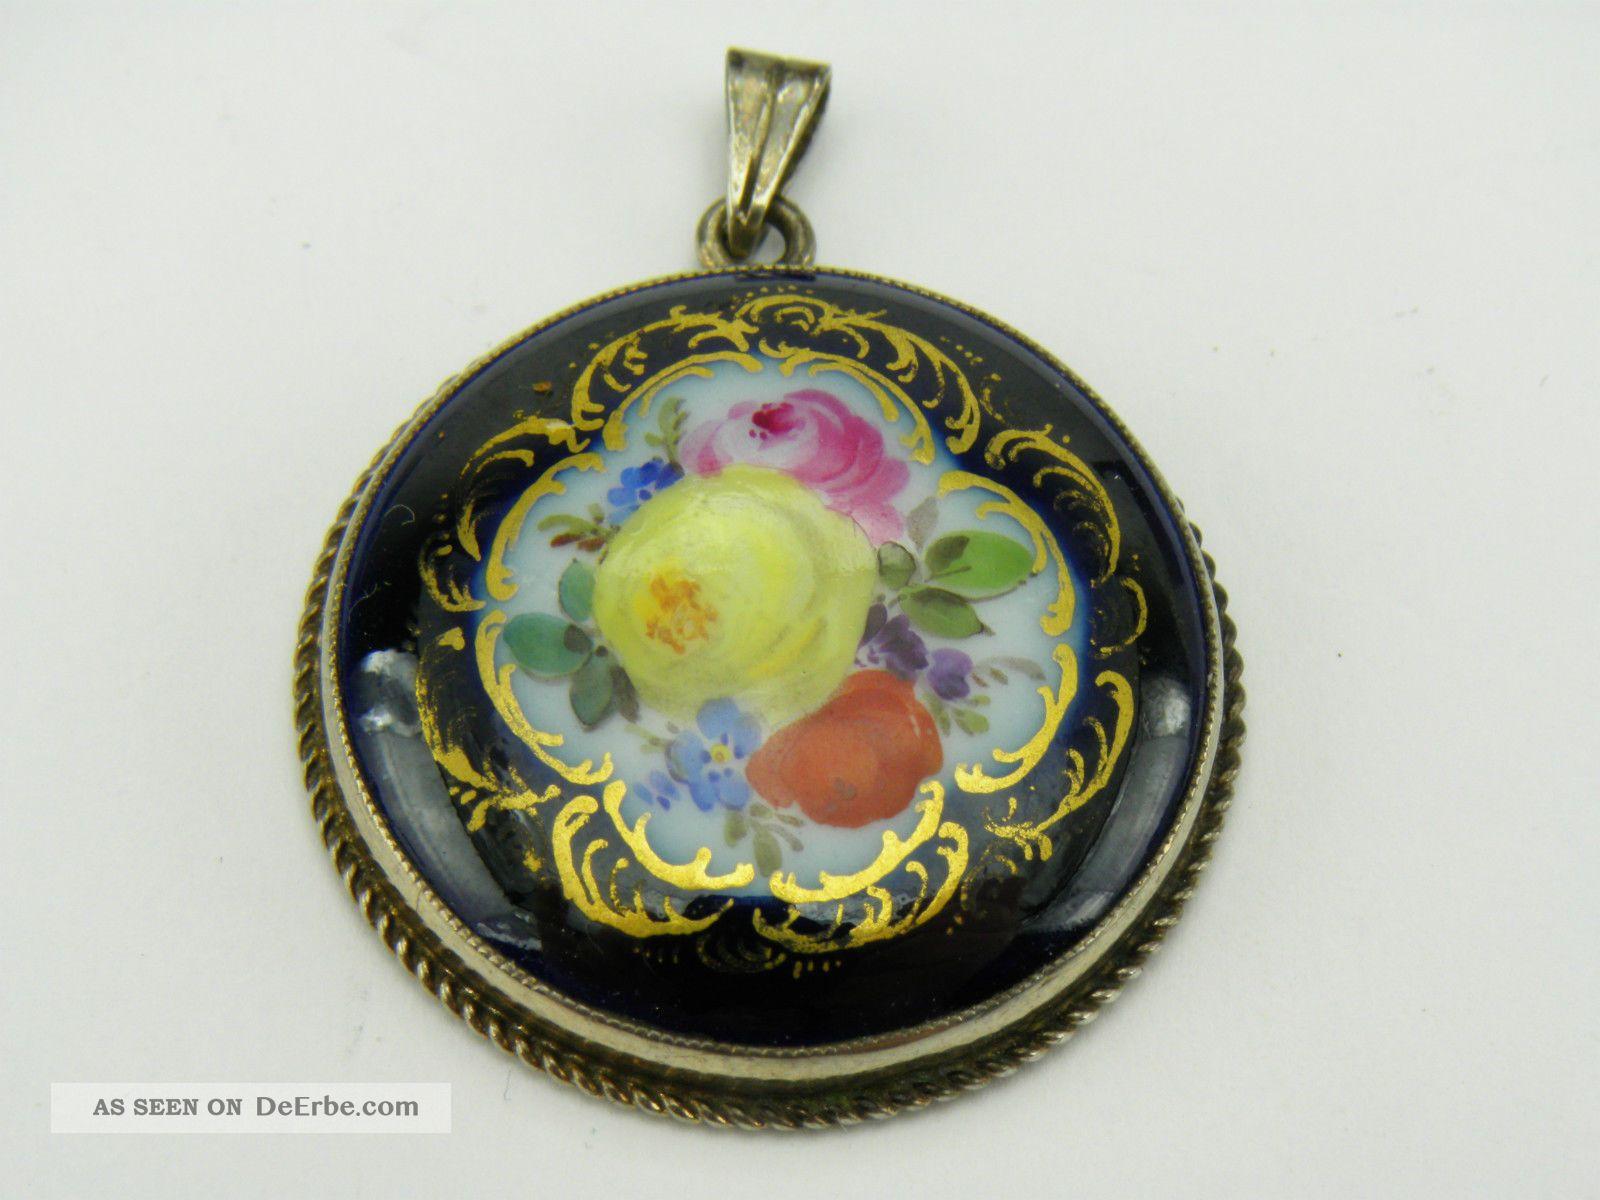 Meissen Blumen Bukett Kobaltblau Gold,  Ketten Anhänger / Medaillon,  Silber 900 Meissen Bild